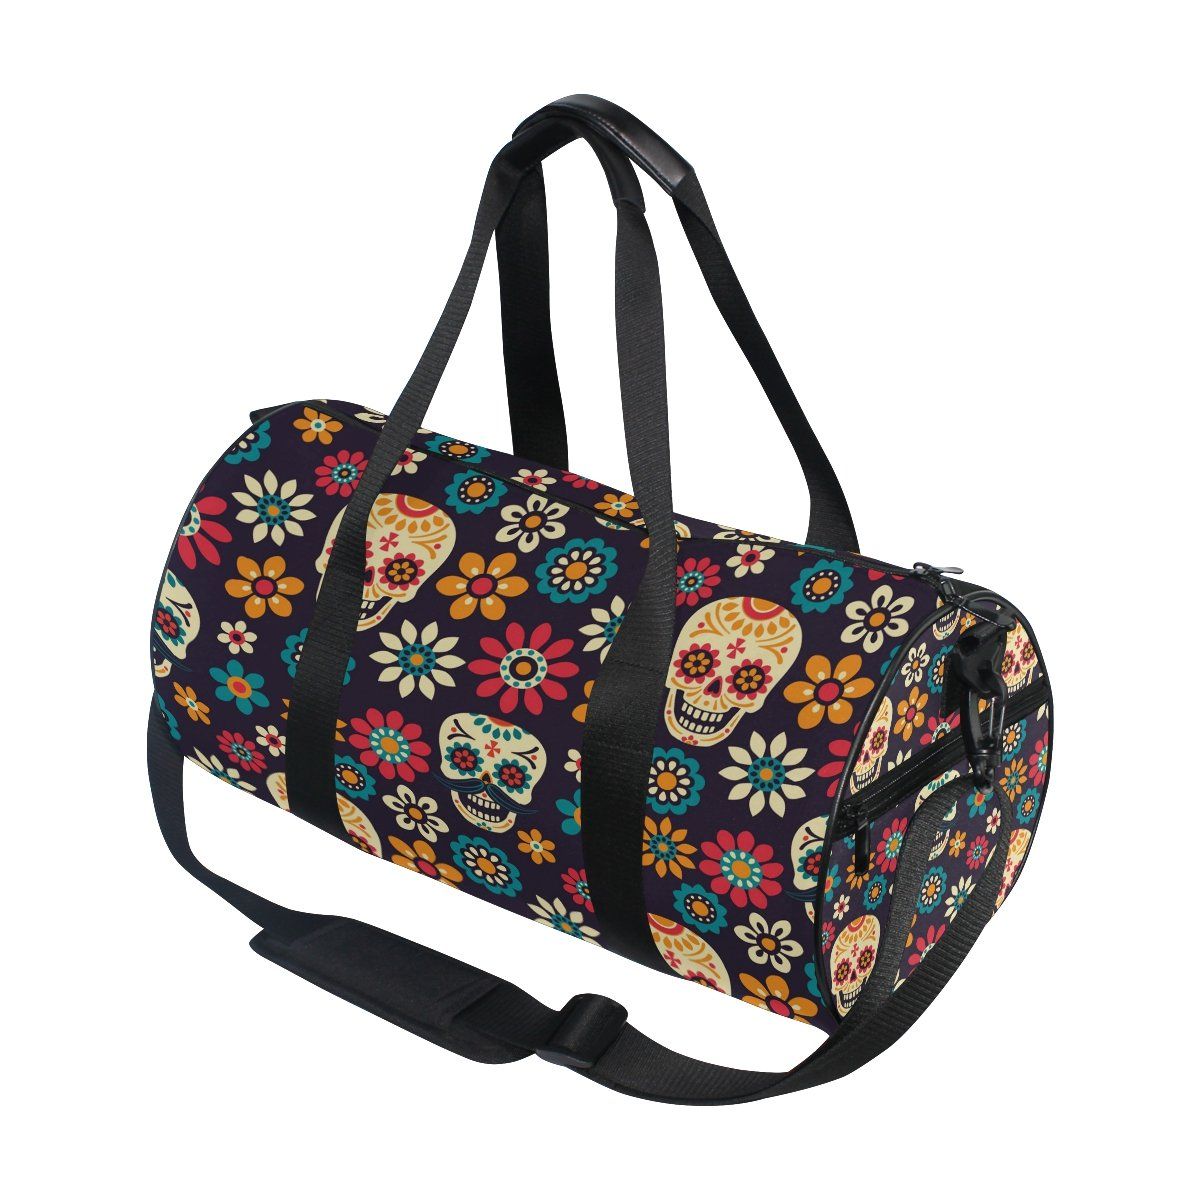 ALAZA Sugar Skull Daisy Flower Travel Duffel Bag Sport Gym Luggage Bag for Men Women g4142094p197c231s330